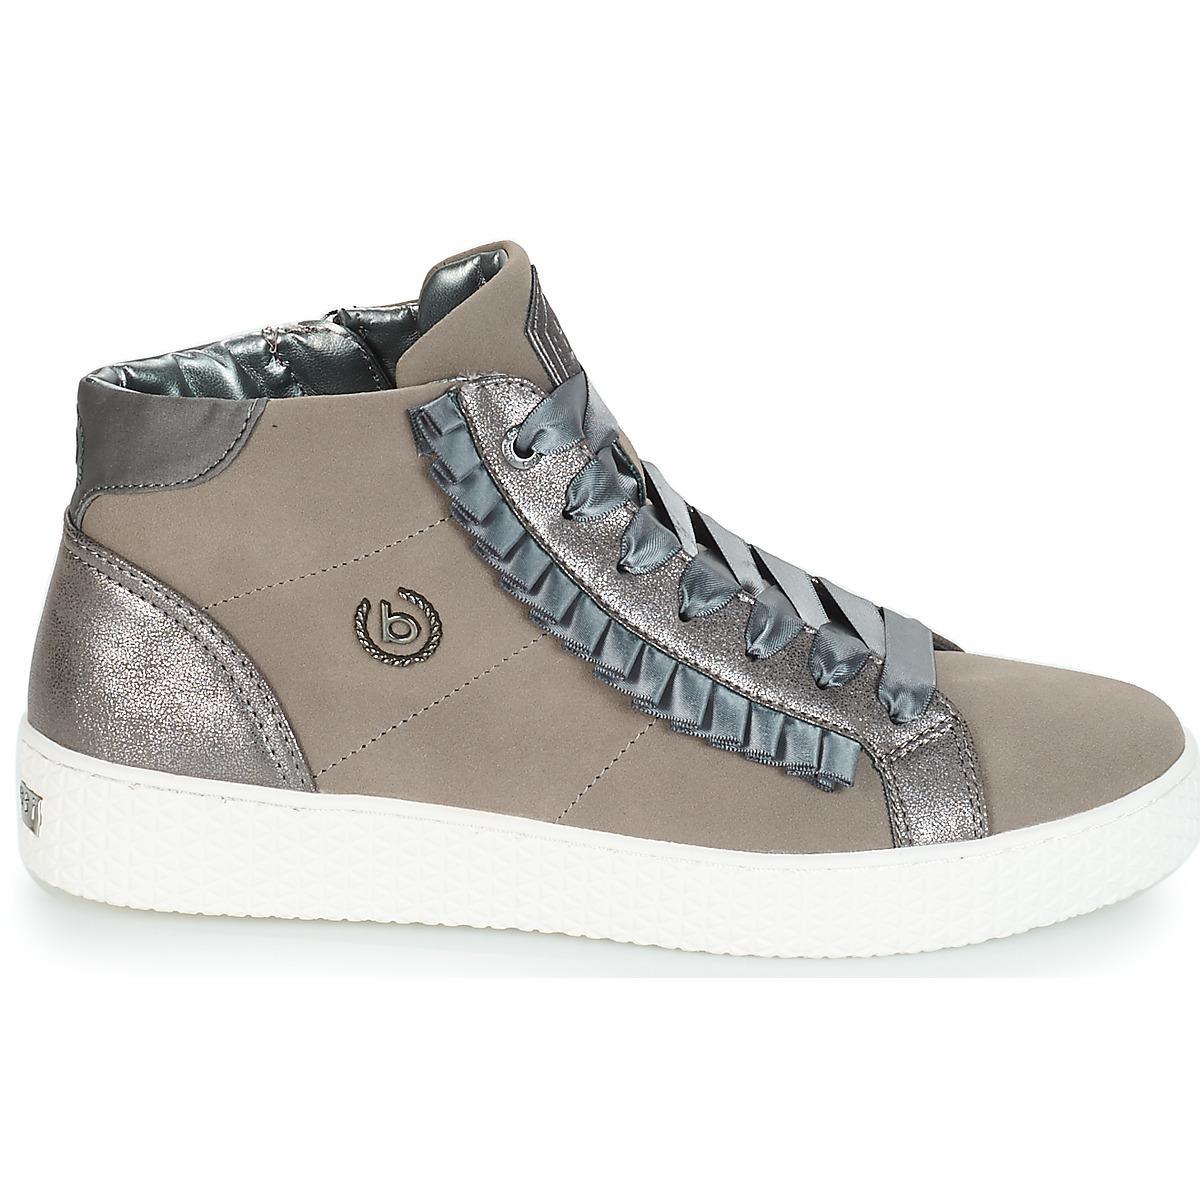 Bugatti Peeji Shoes (high-top Trainers) in Gray - Lyst 839d3c28cf